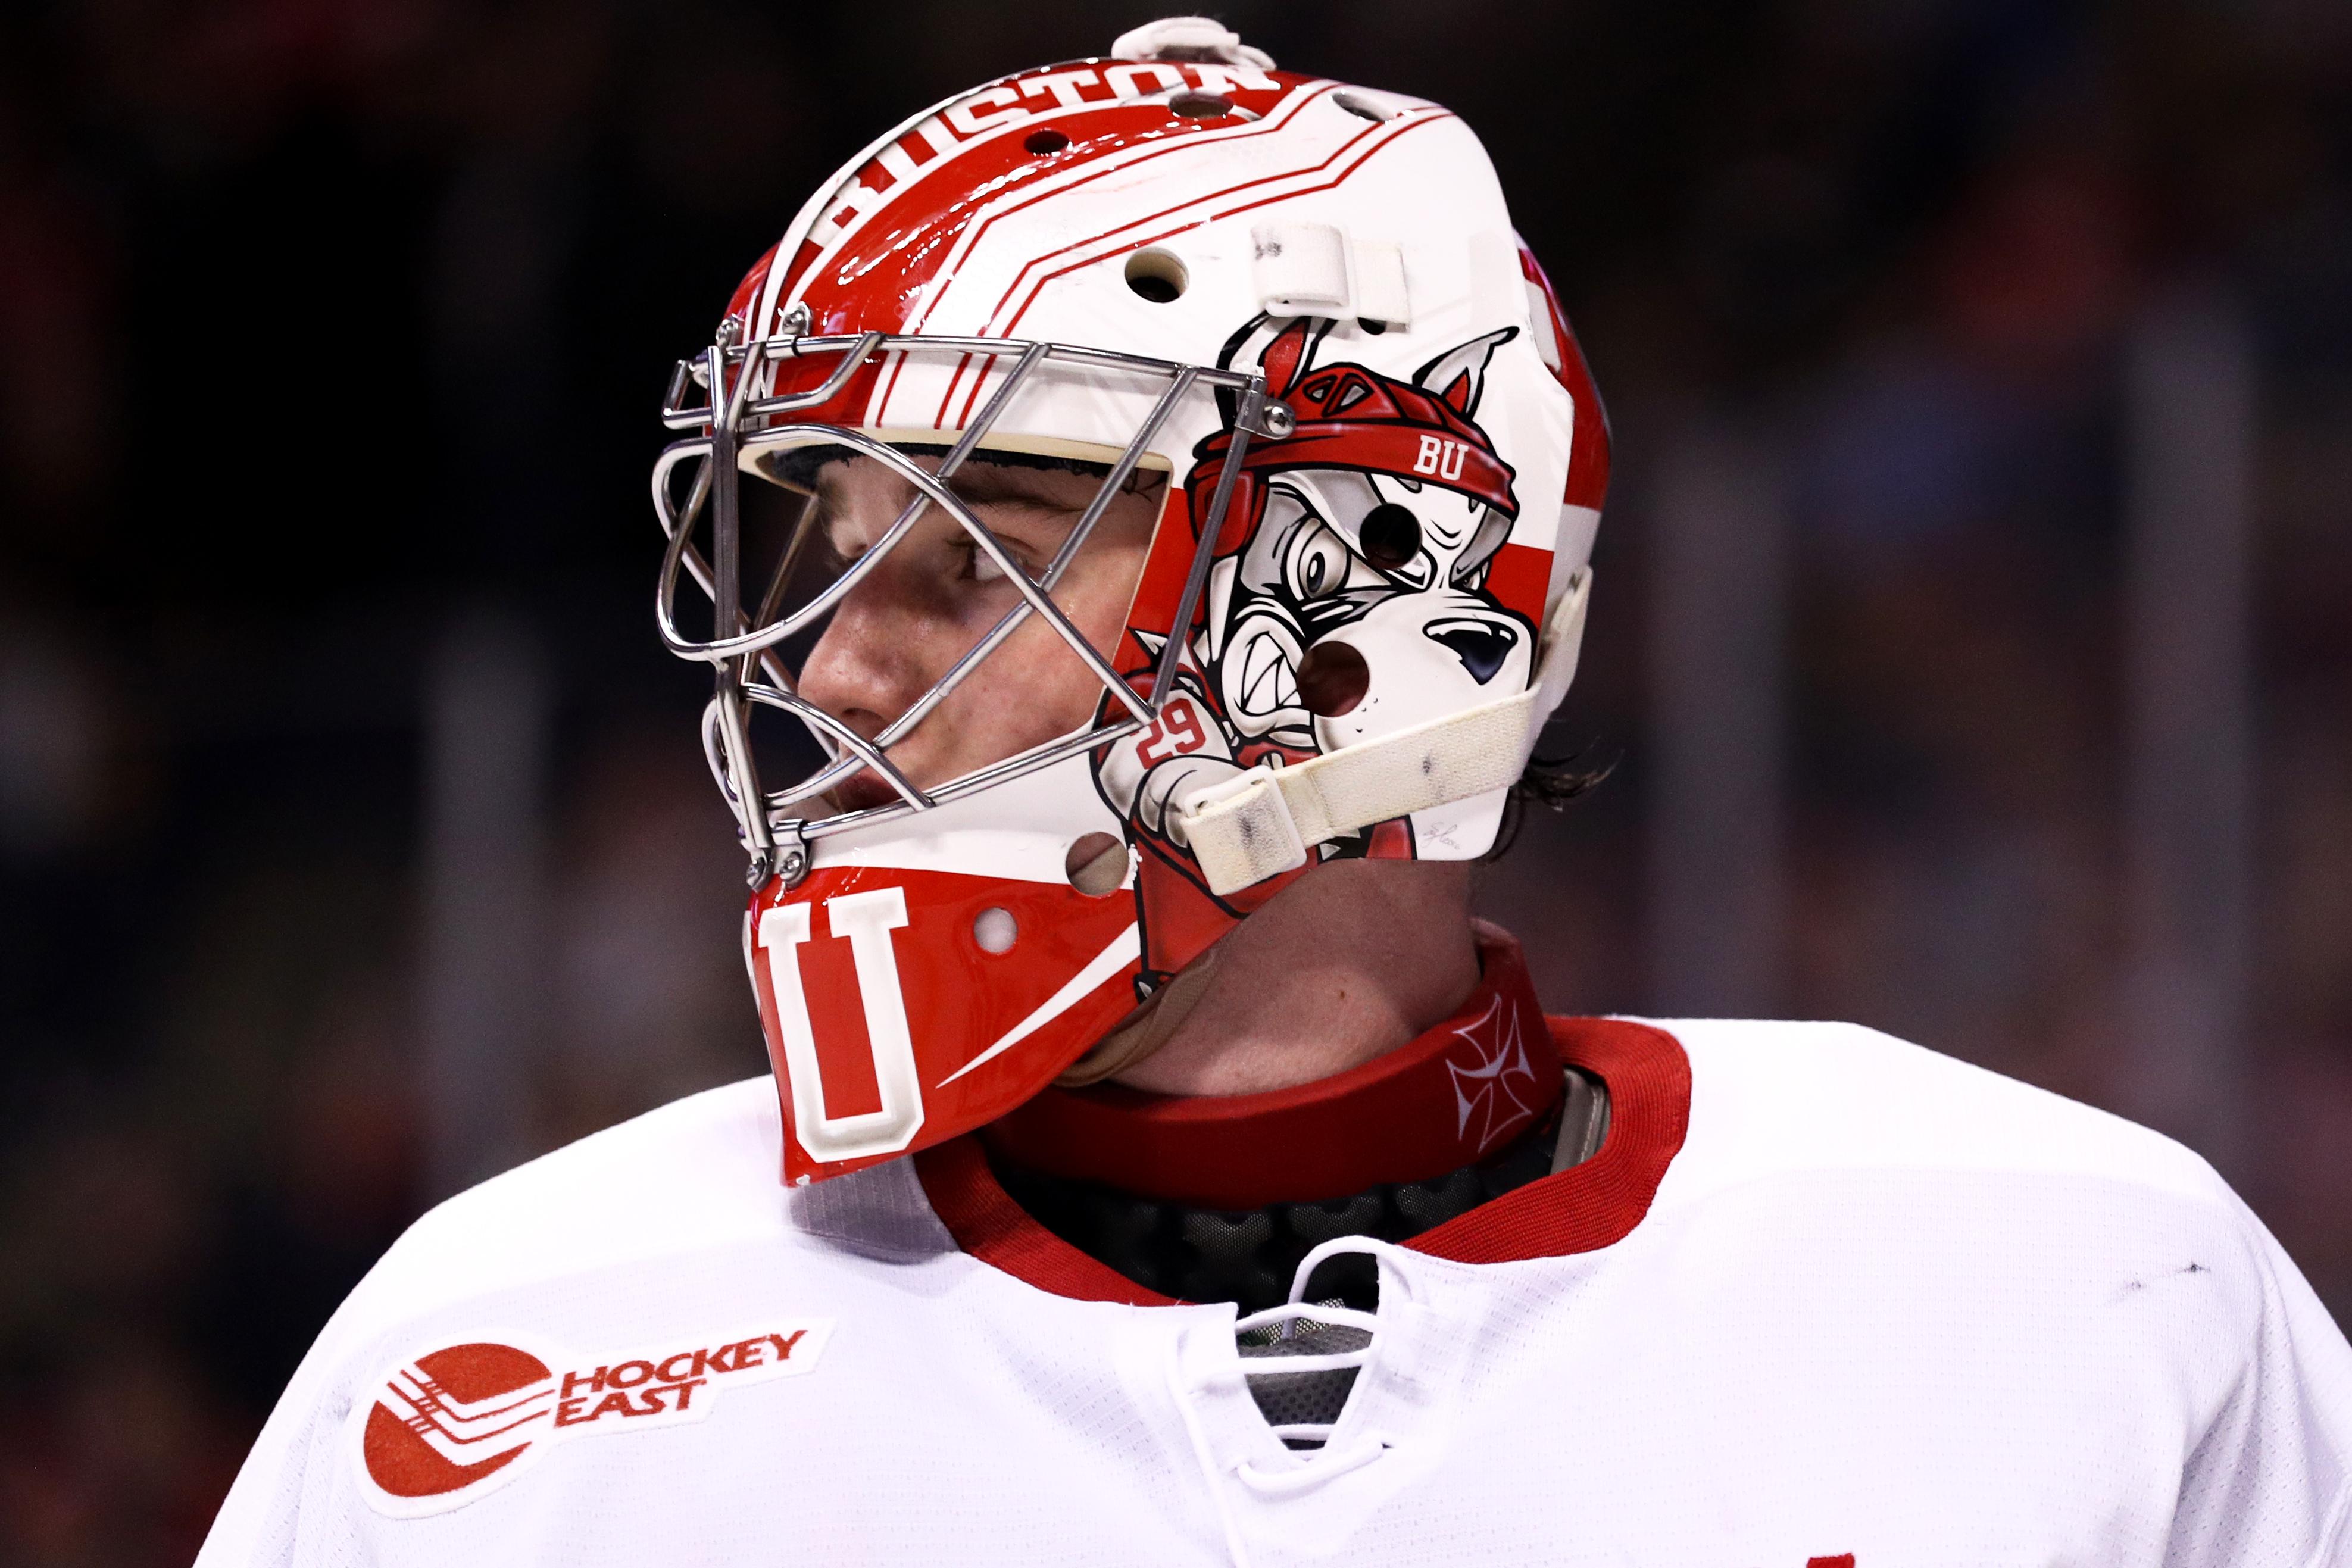 Hockey East: Jake Oettinger - 2017 NHL Draft Prospect Profile